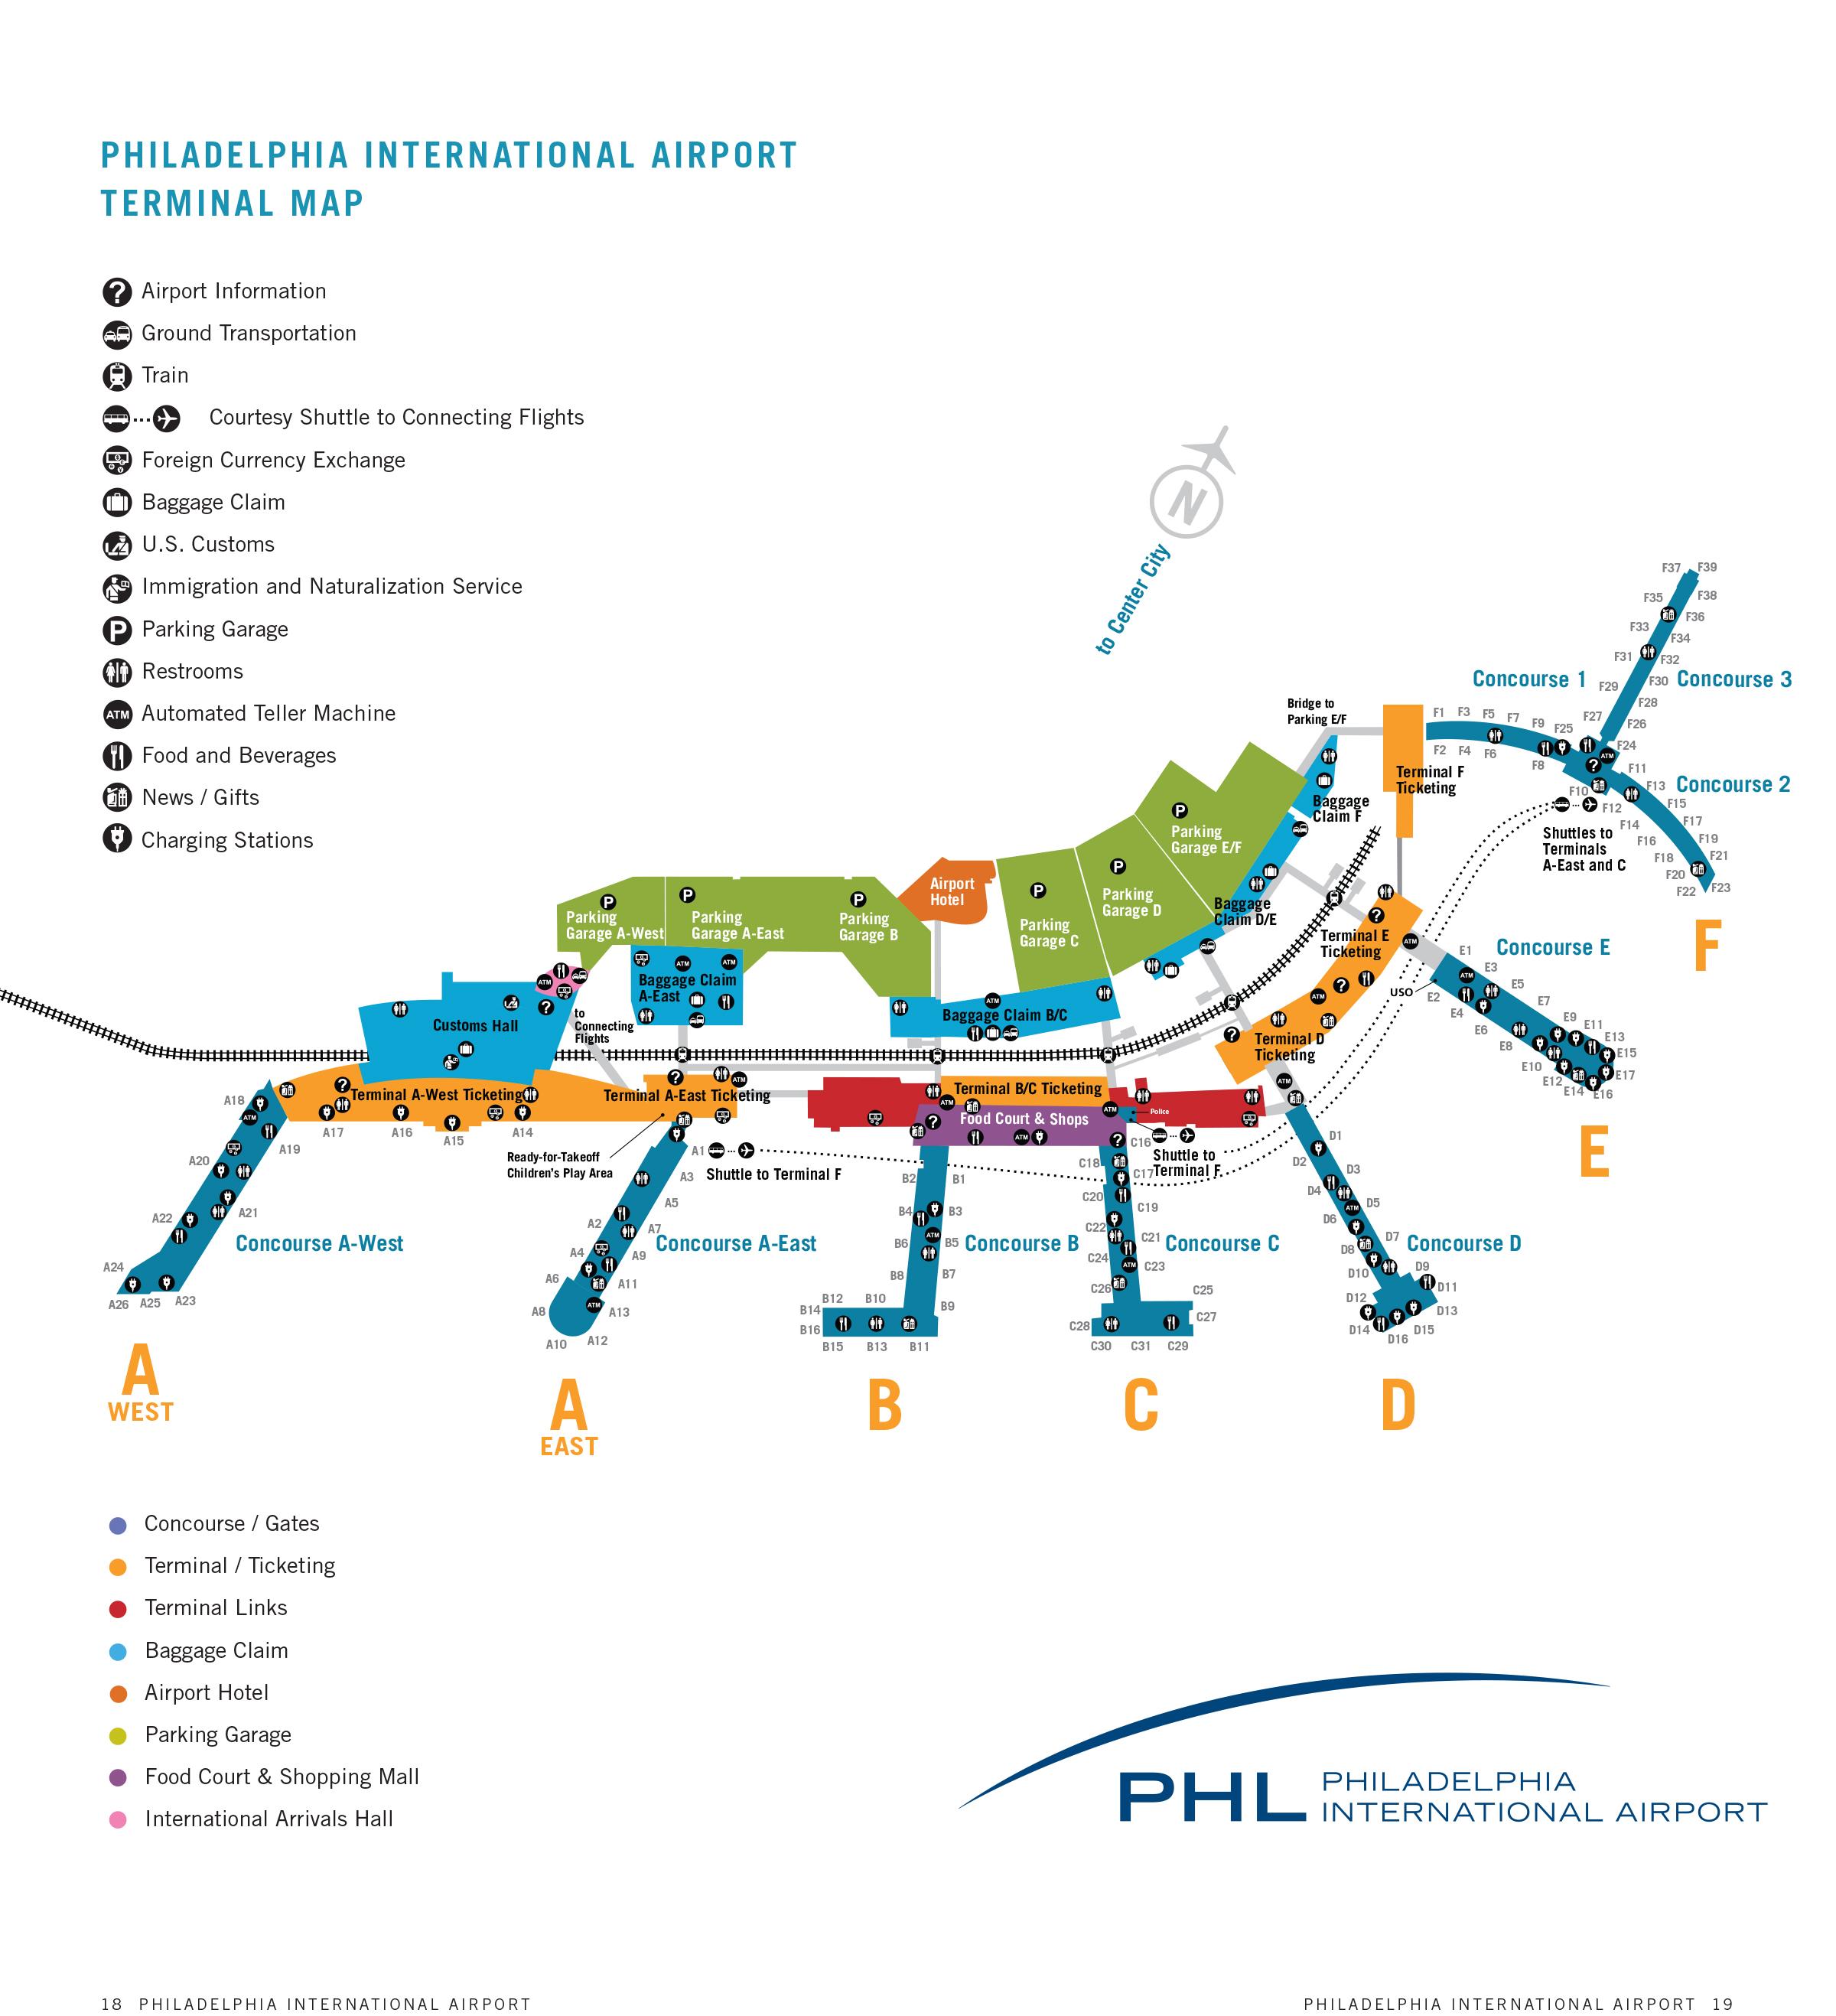 Philadelphia International Airport Map (PHL) - Printable Terminal ...